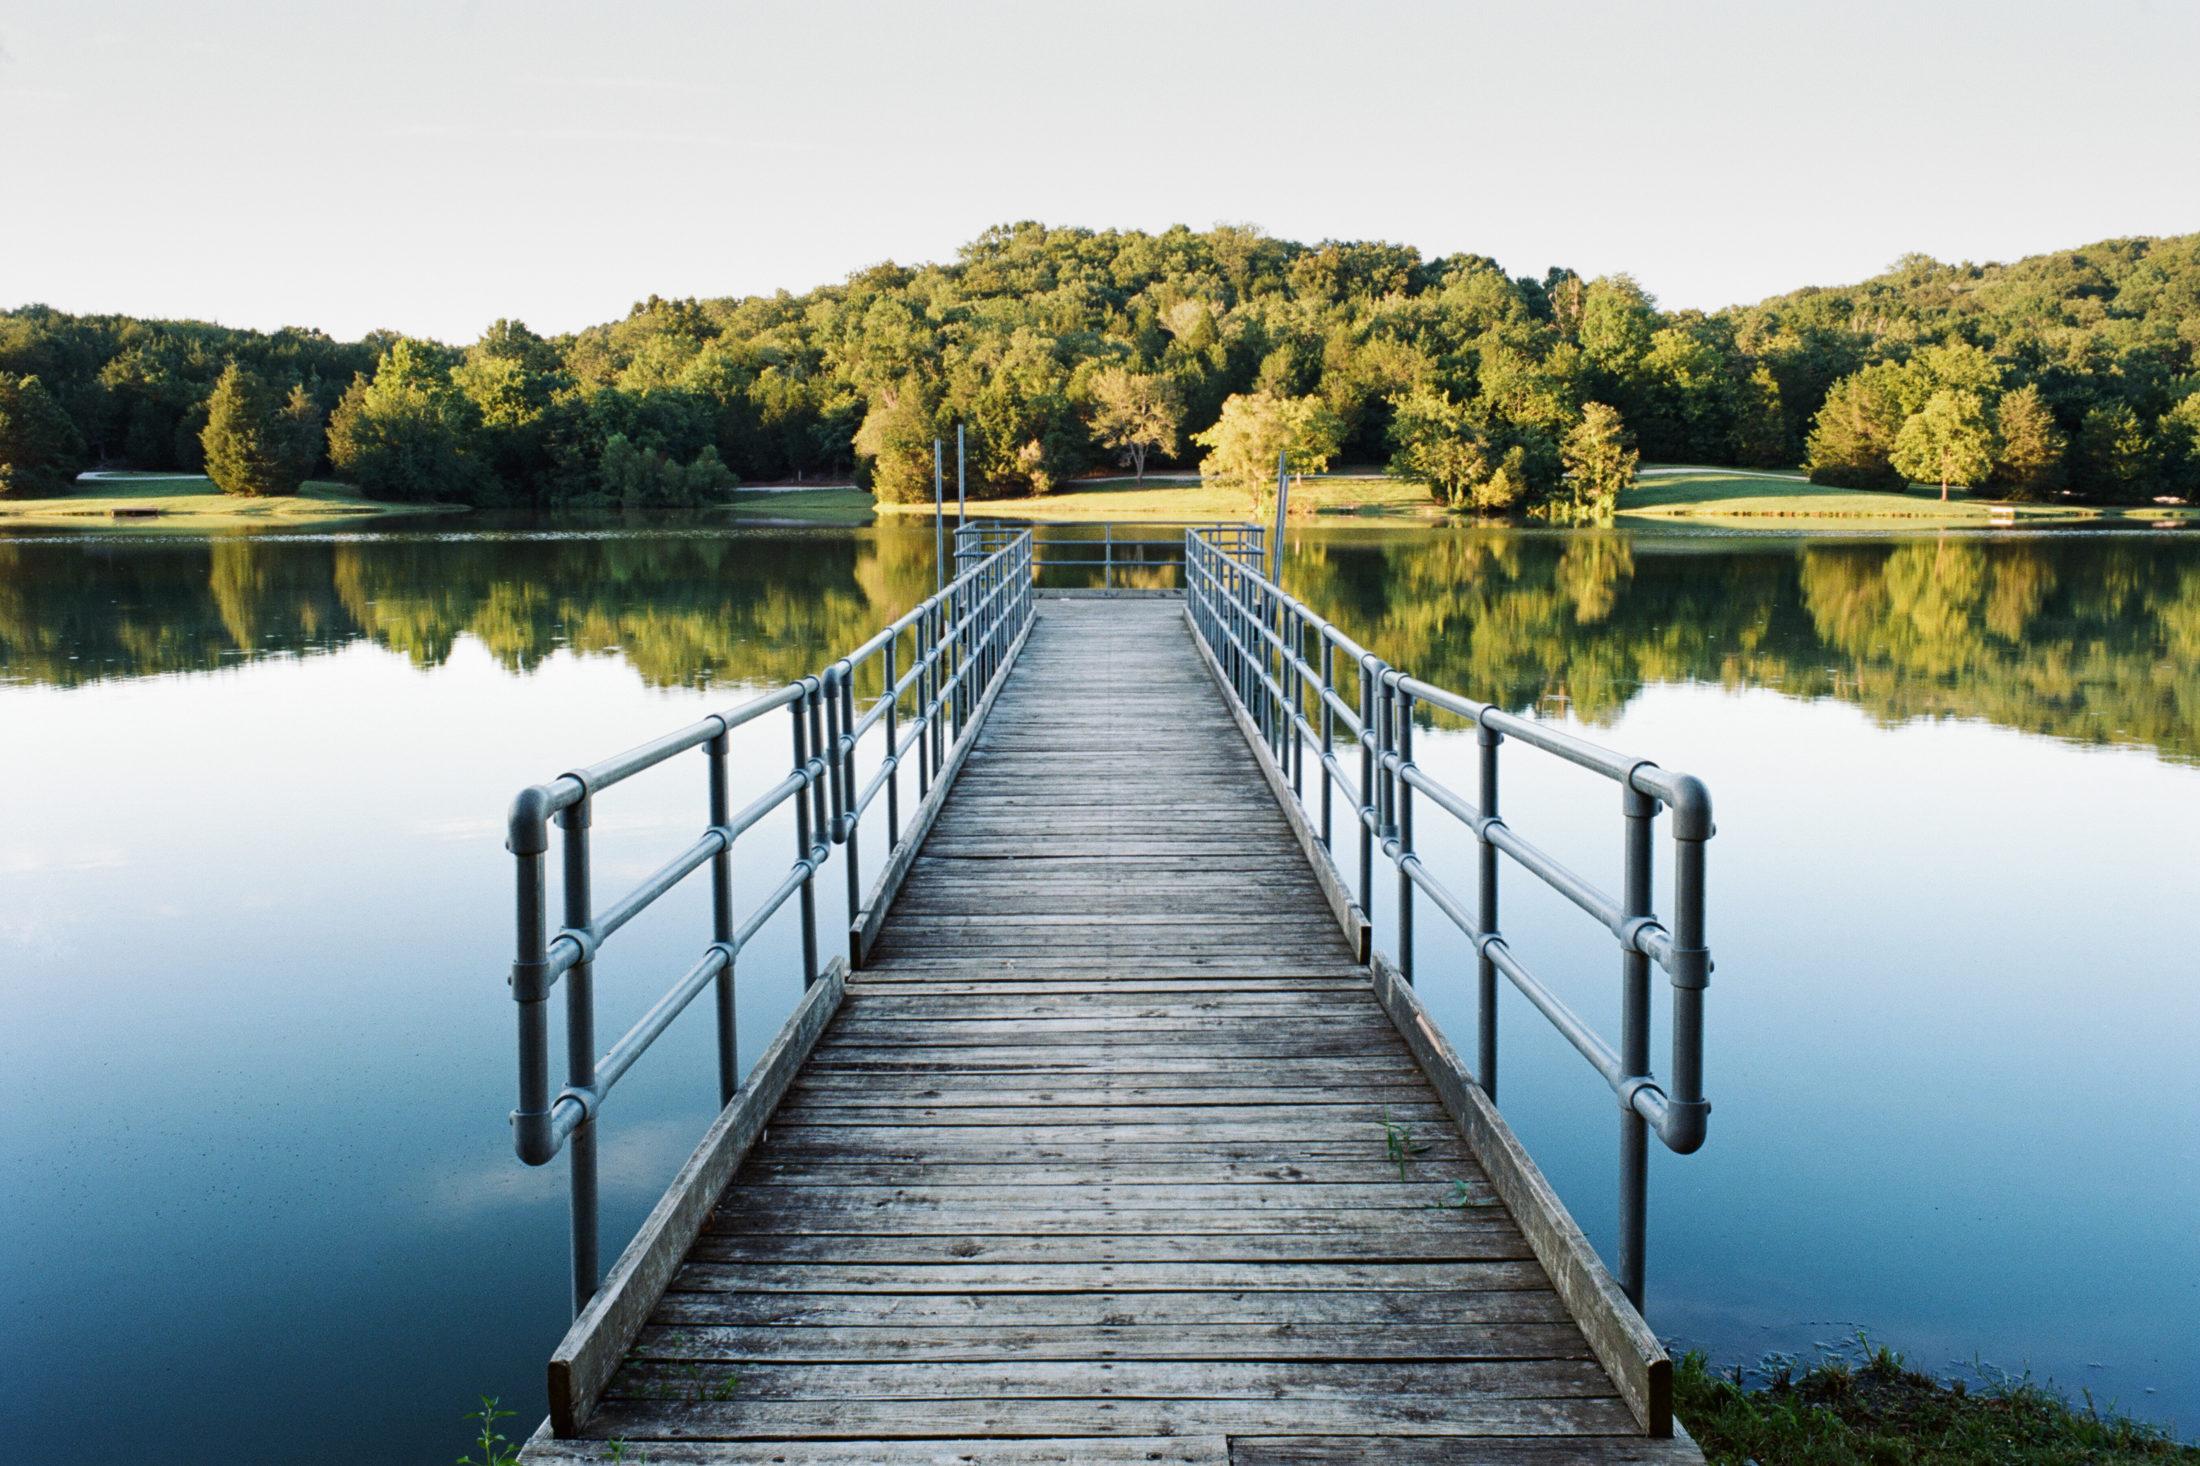 Random Landscapes Across 5 Counties